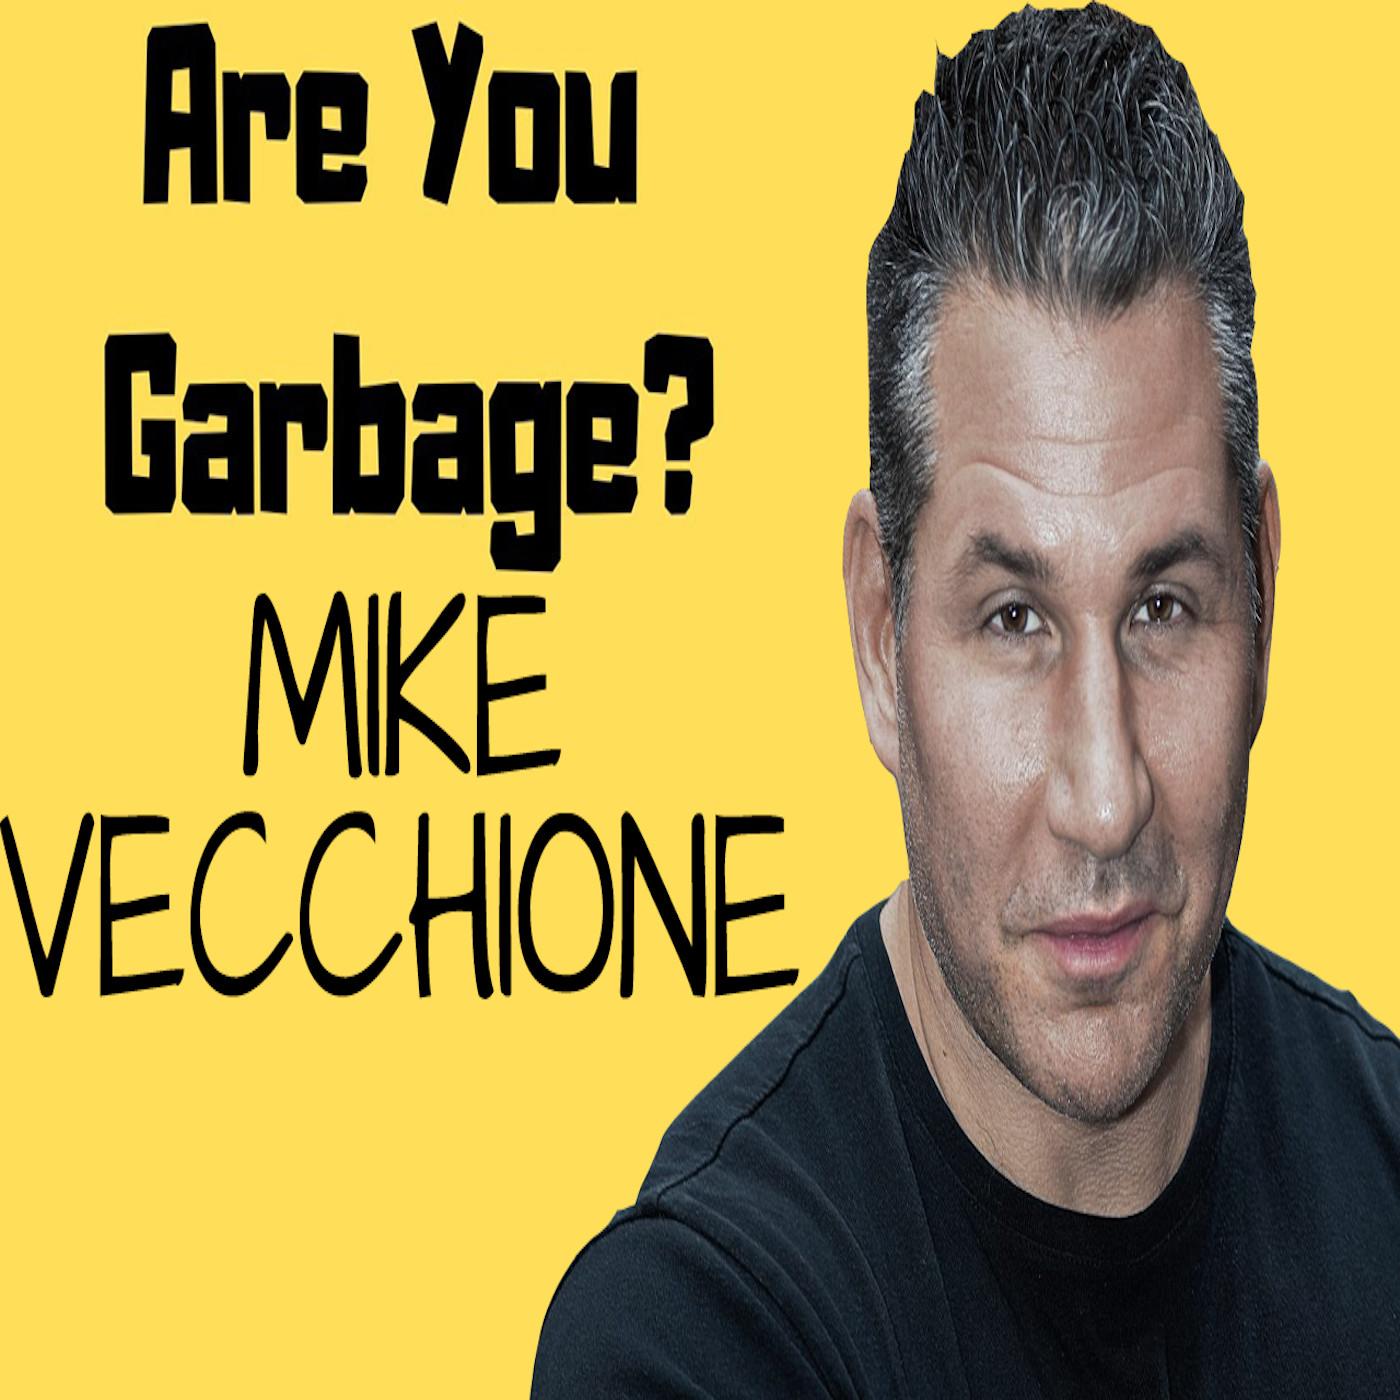 Mike Vecchione: Florida Class